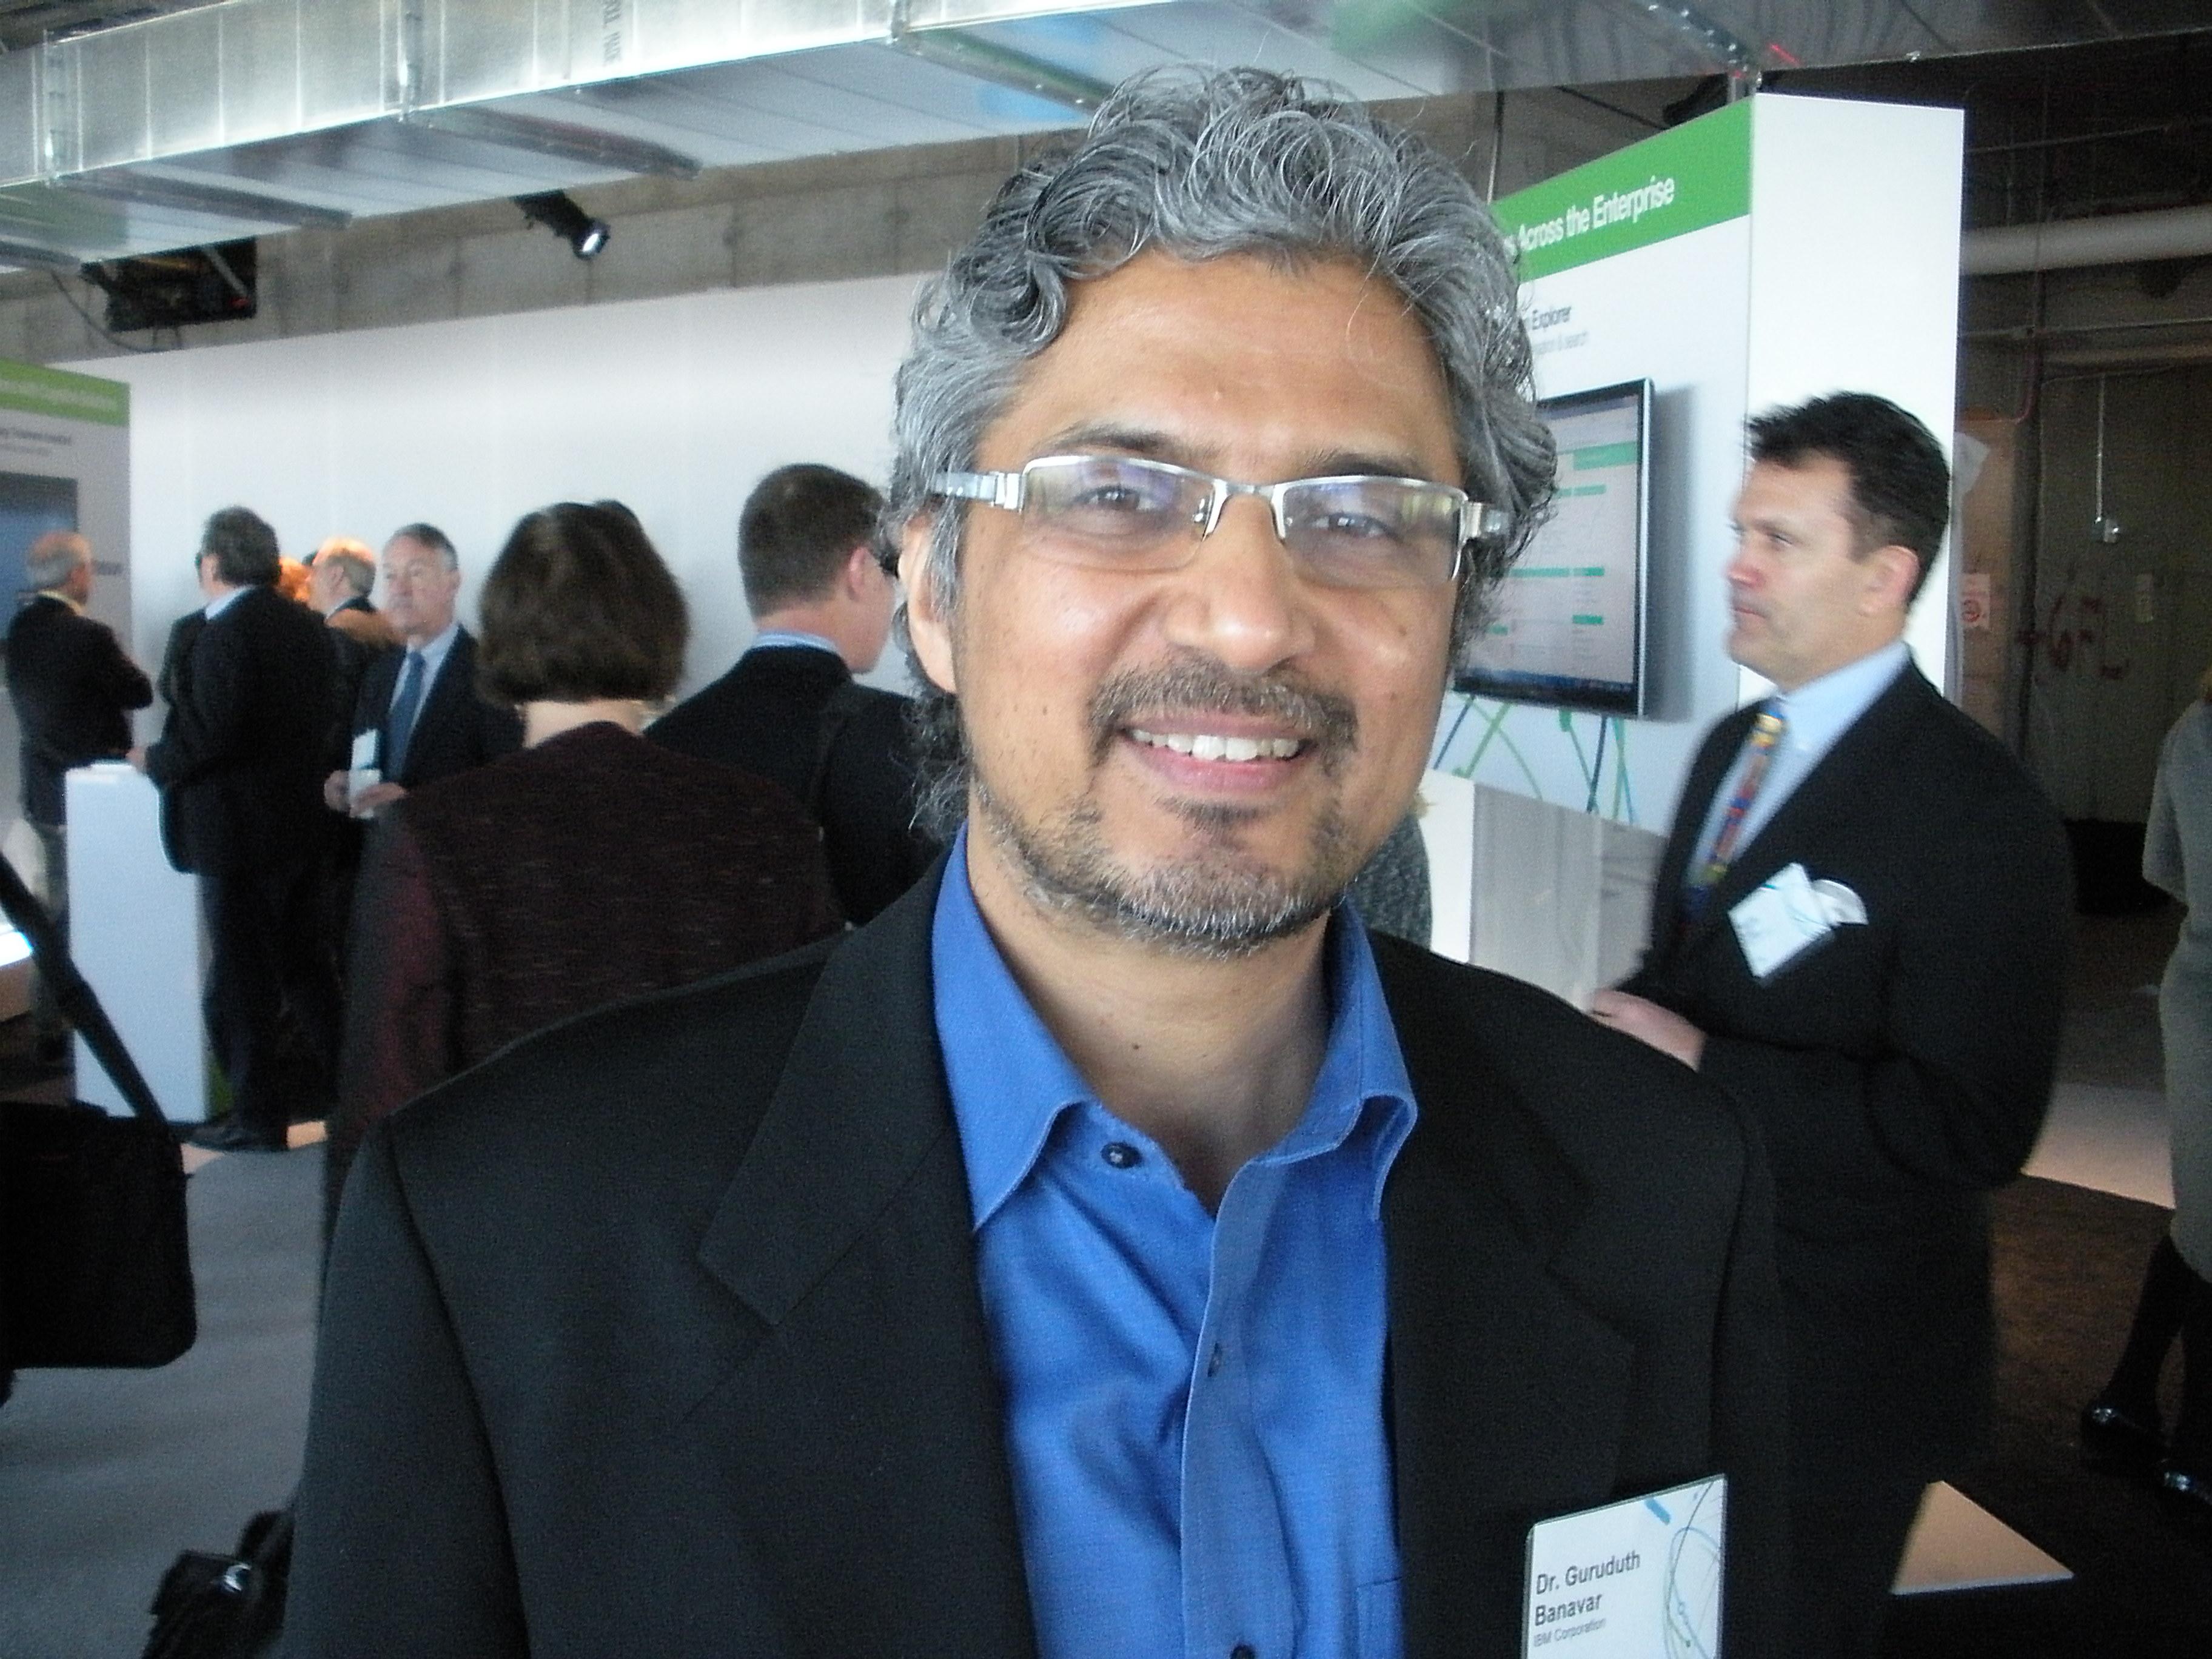 Guru Banavar, VP, Cognitive Computing Research at IBM.